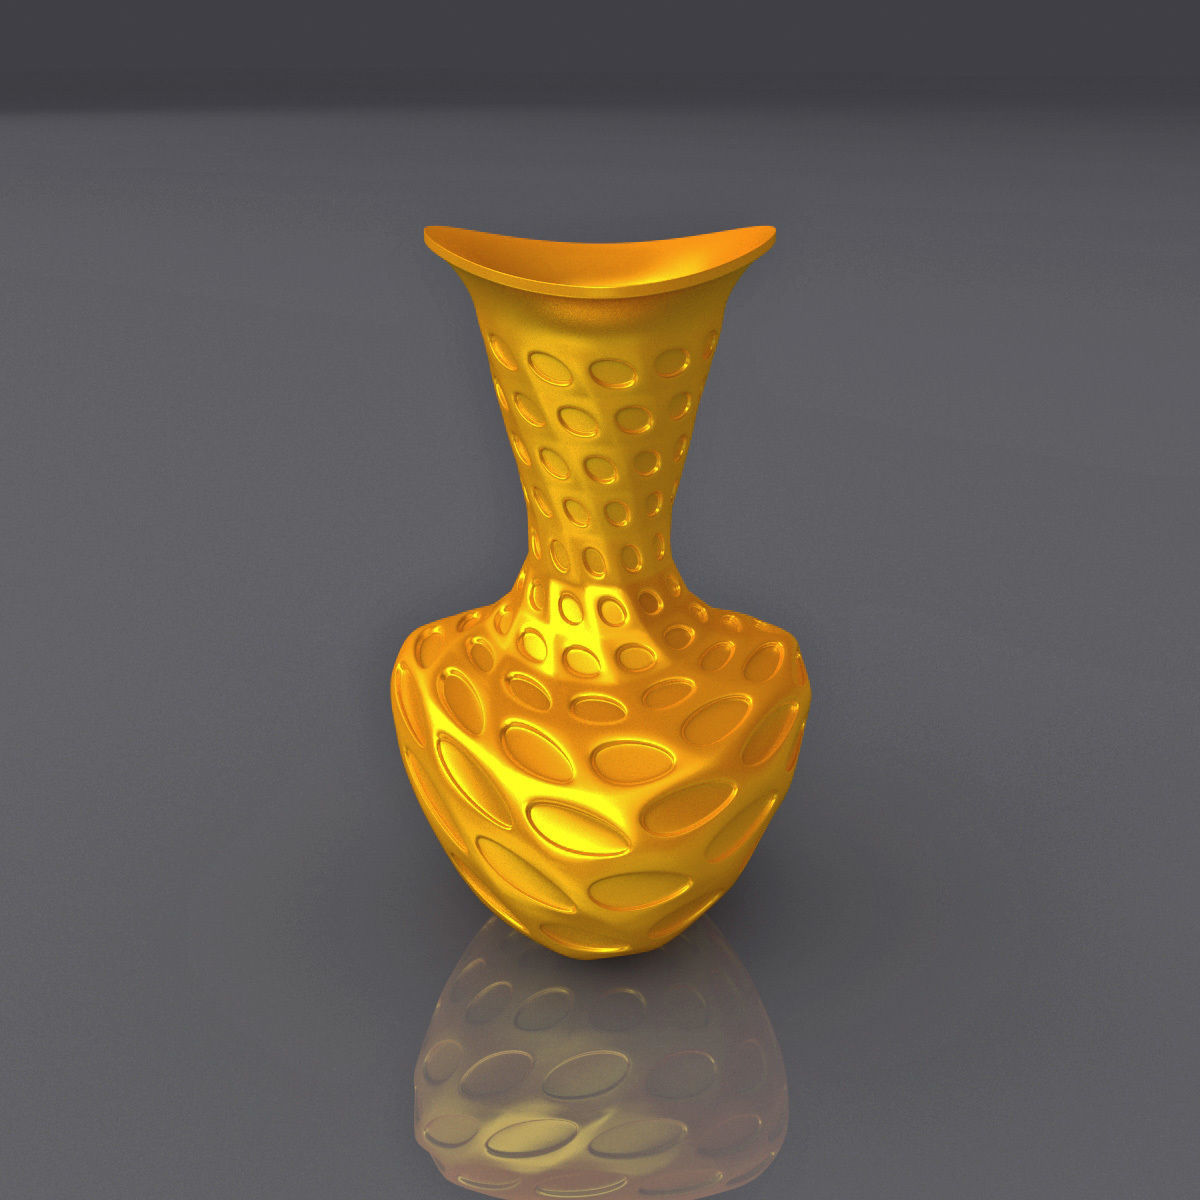 Perforated Surface Vase Design 3D Print Model